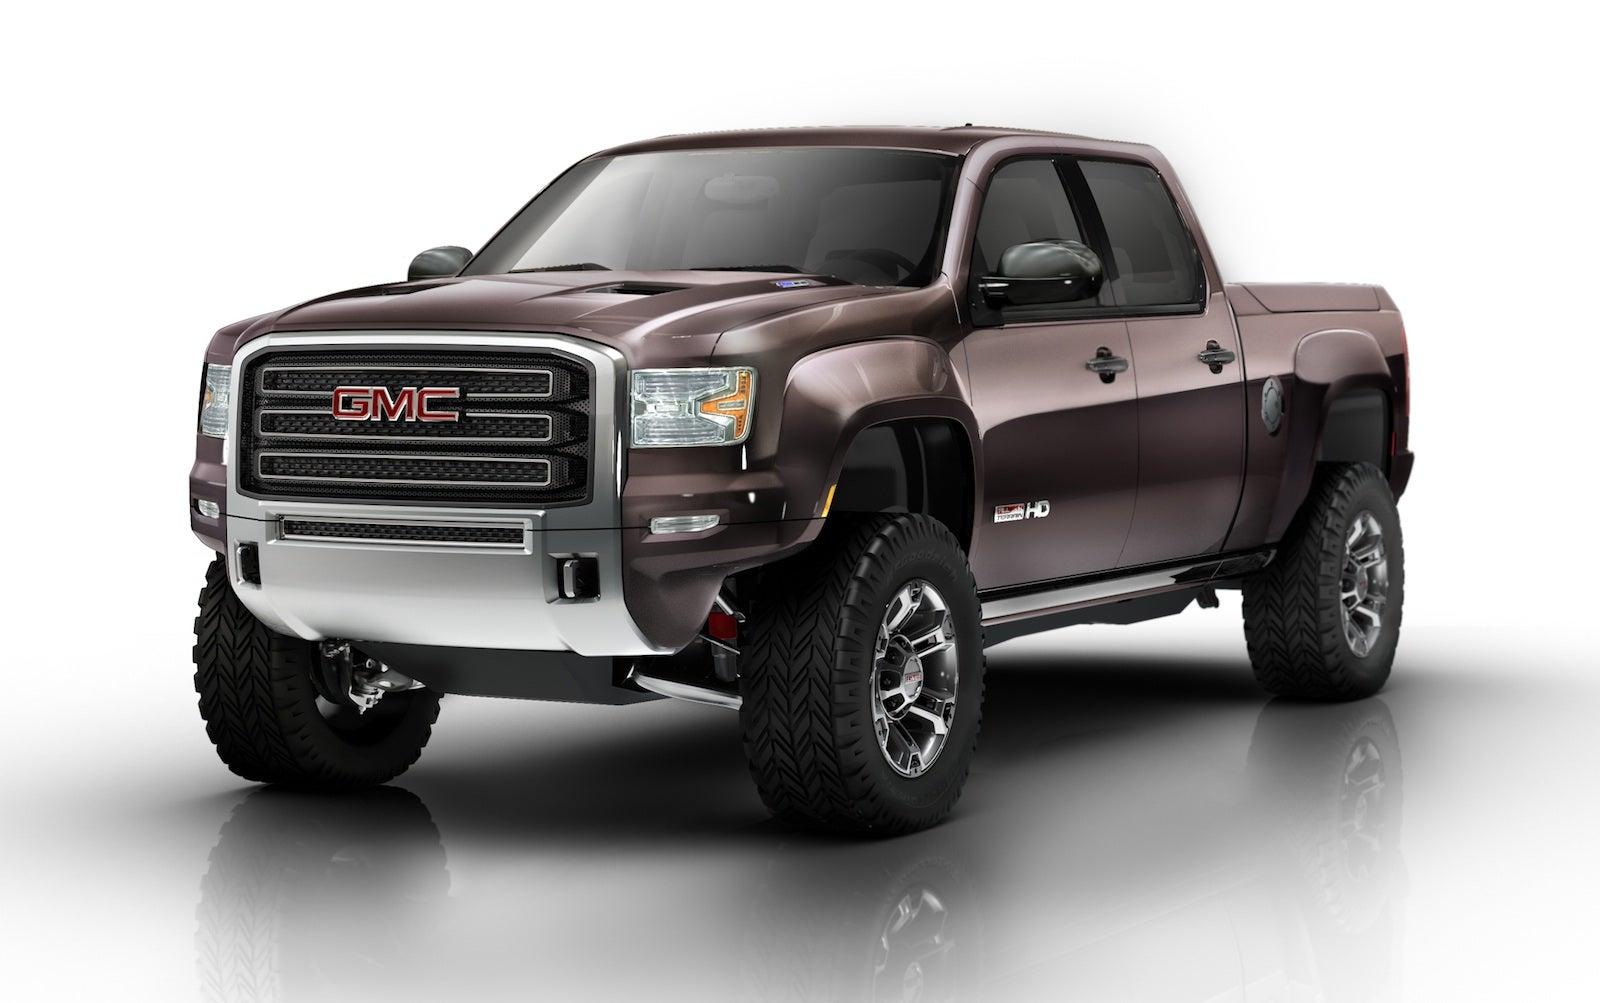 GMC Sierra All Terrain HD Concept: Diesel-Powered Off-Road ...